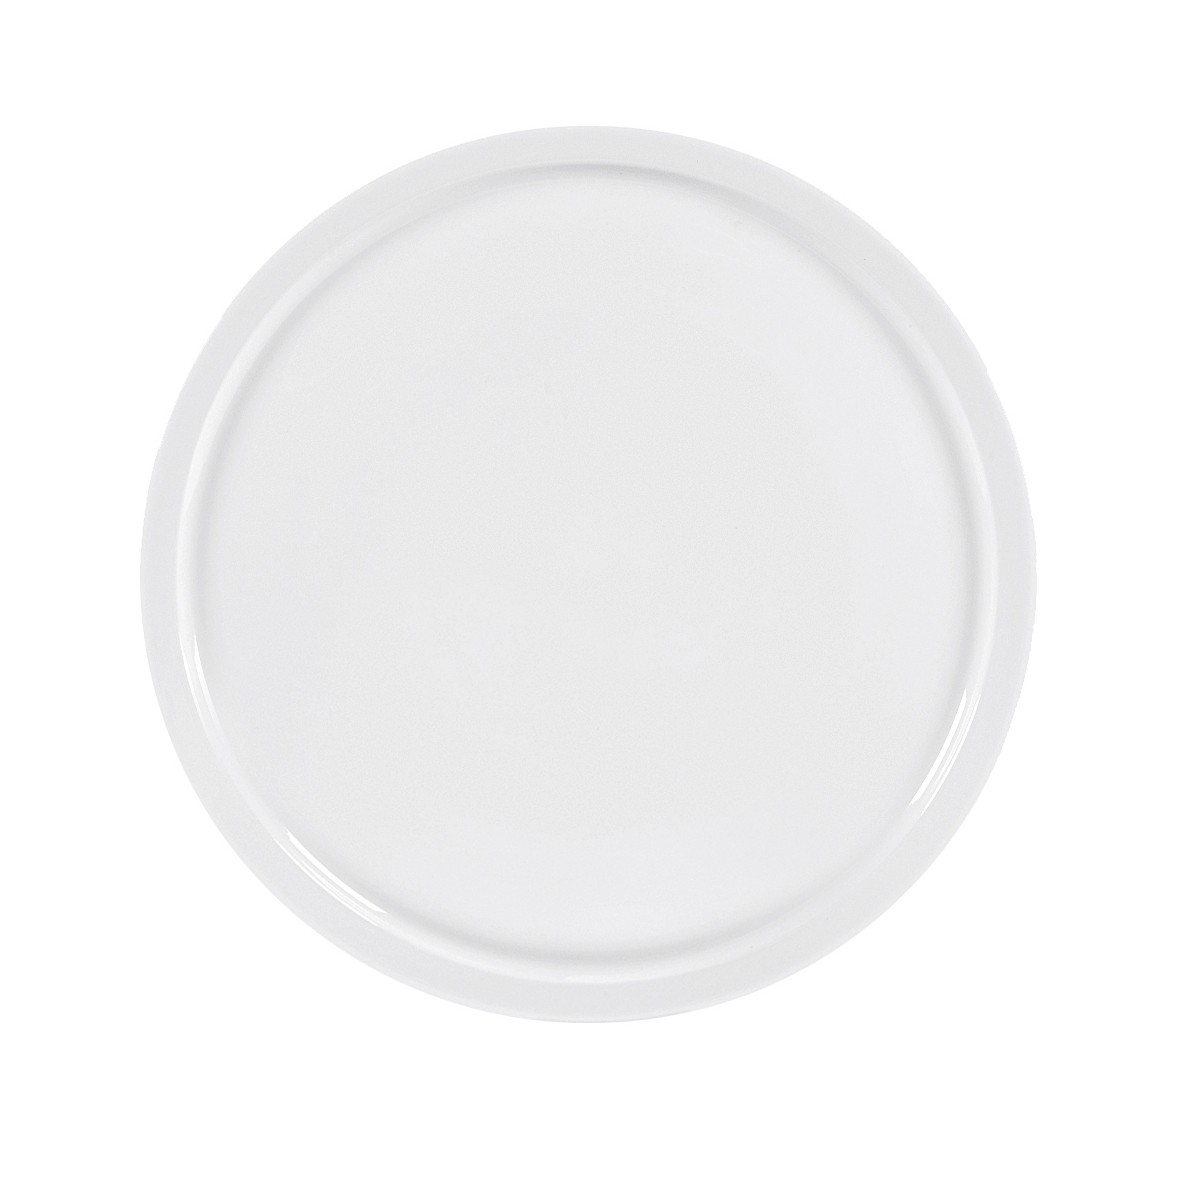 wellco 3420060 design pizzateller 31cm porzellan wei 1 st ck ebay. Black Bedroom Furniture Sets. Home Design Ideas